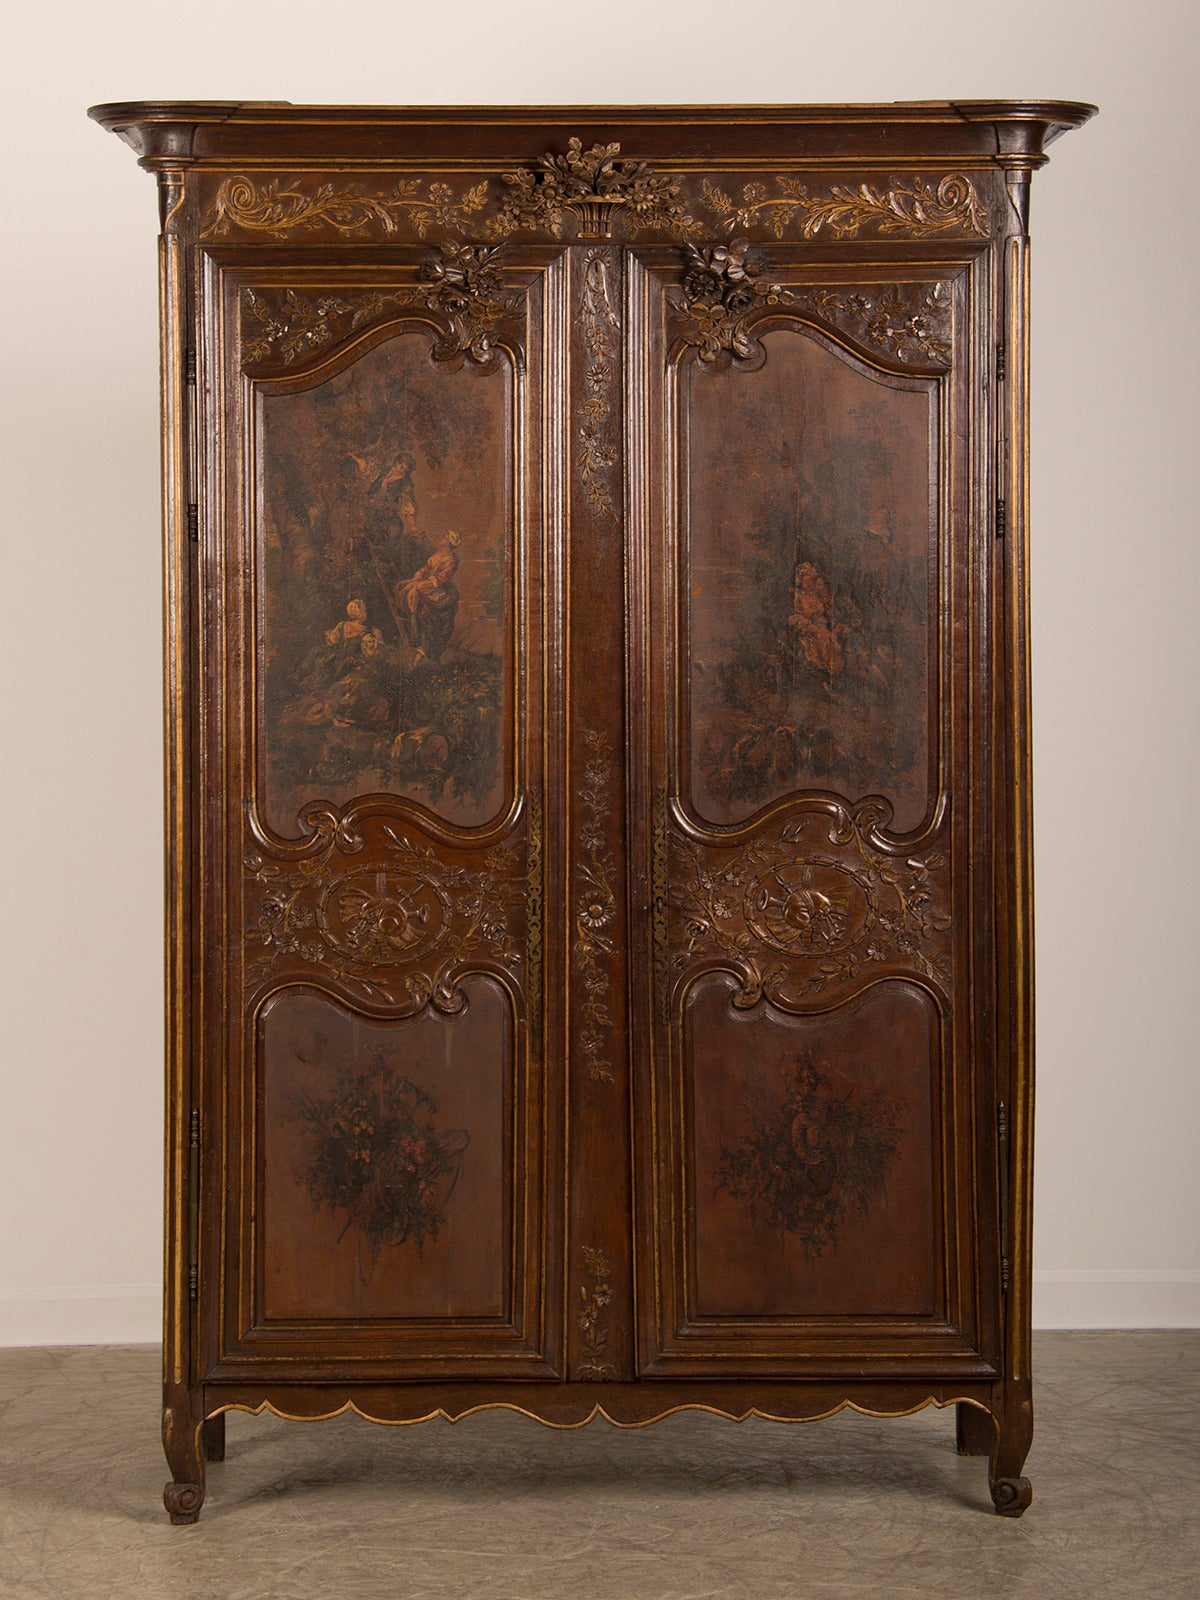 louis xv louis xvi marriage armoire original painted. Black Bedroom Furniture Sets. Home Design Ideas